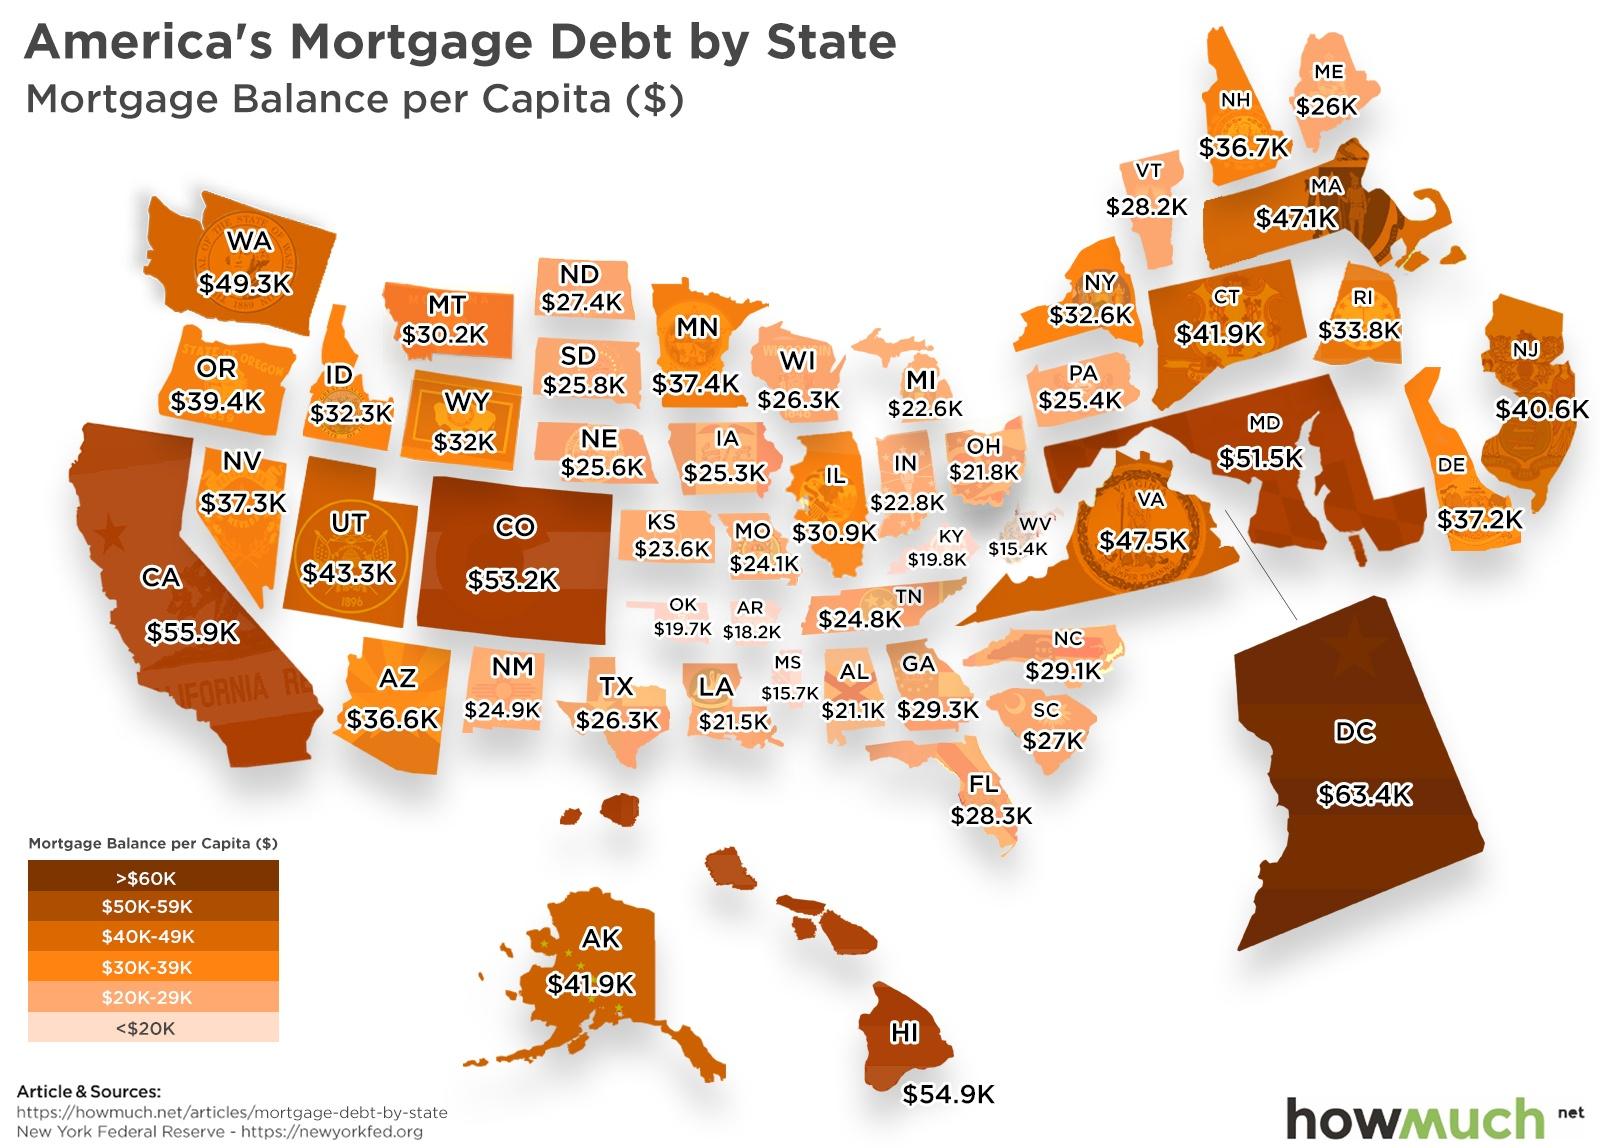 Average Mortgage Debt